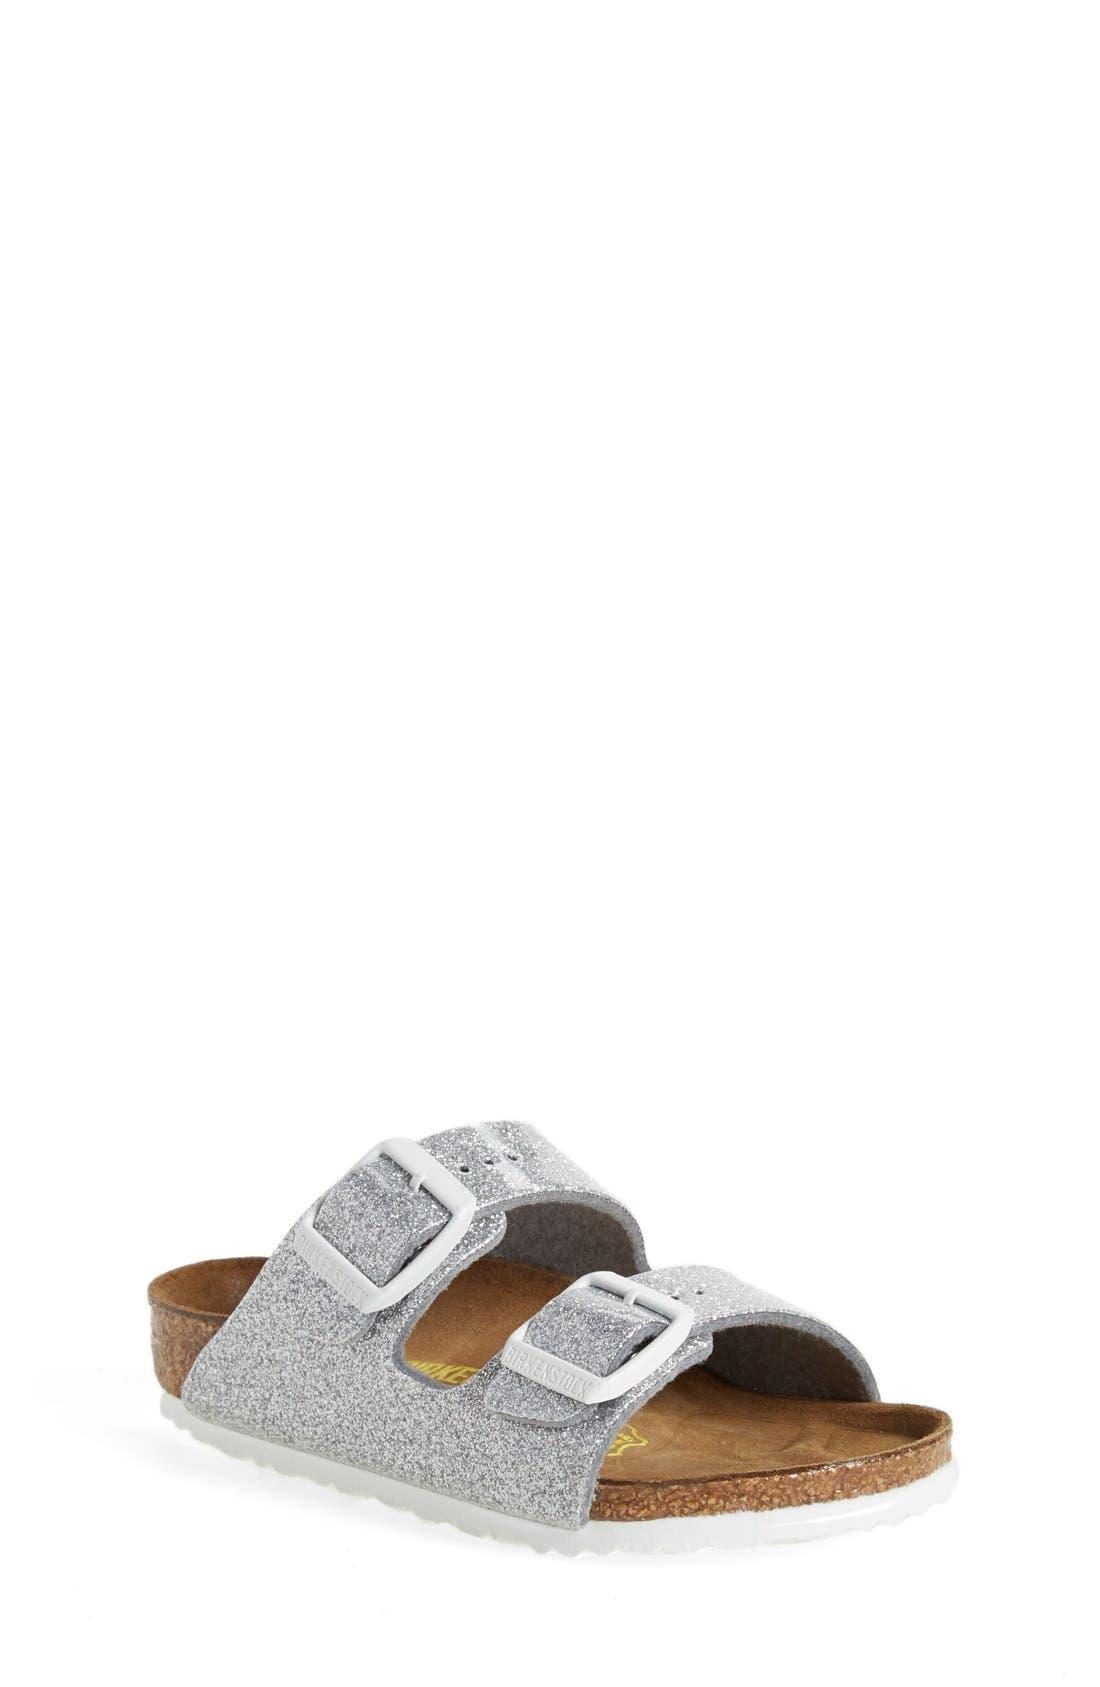 'Arizona Galaxy Birko-Flor' Slide Sandal,                             Main thumbnail 2, color,